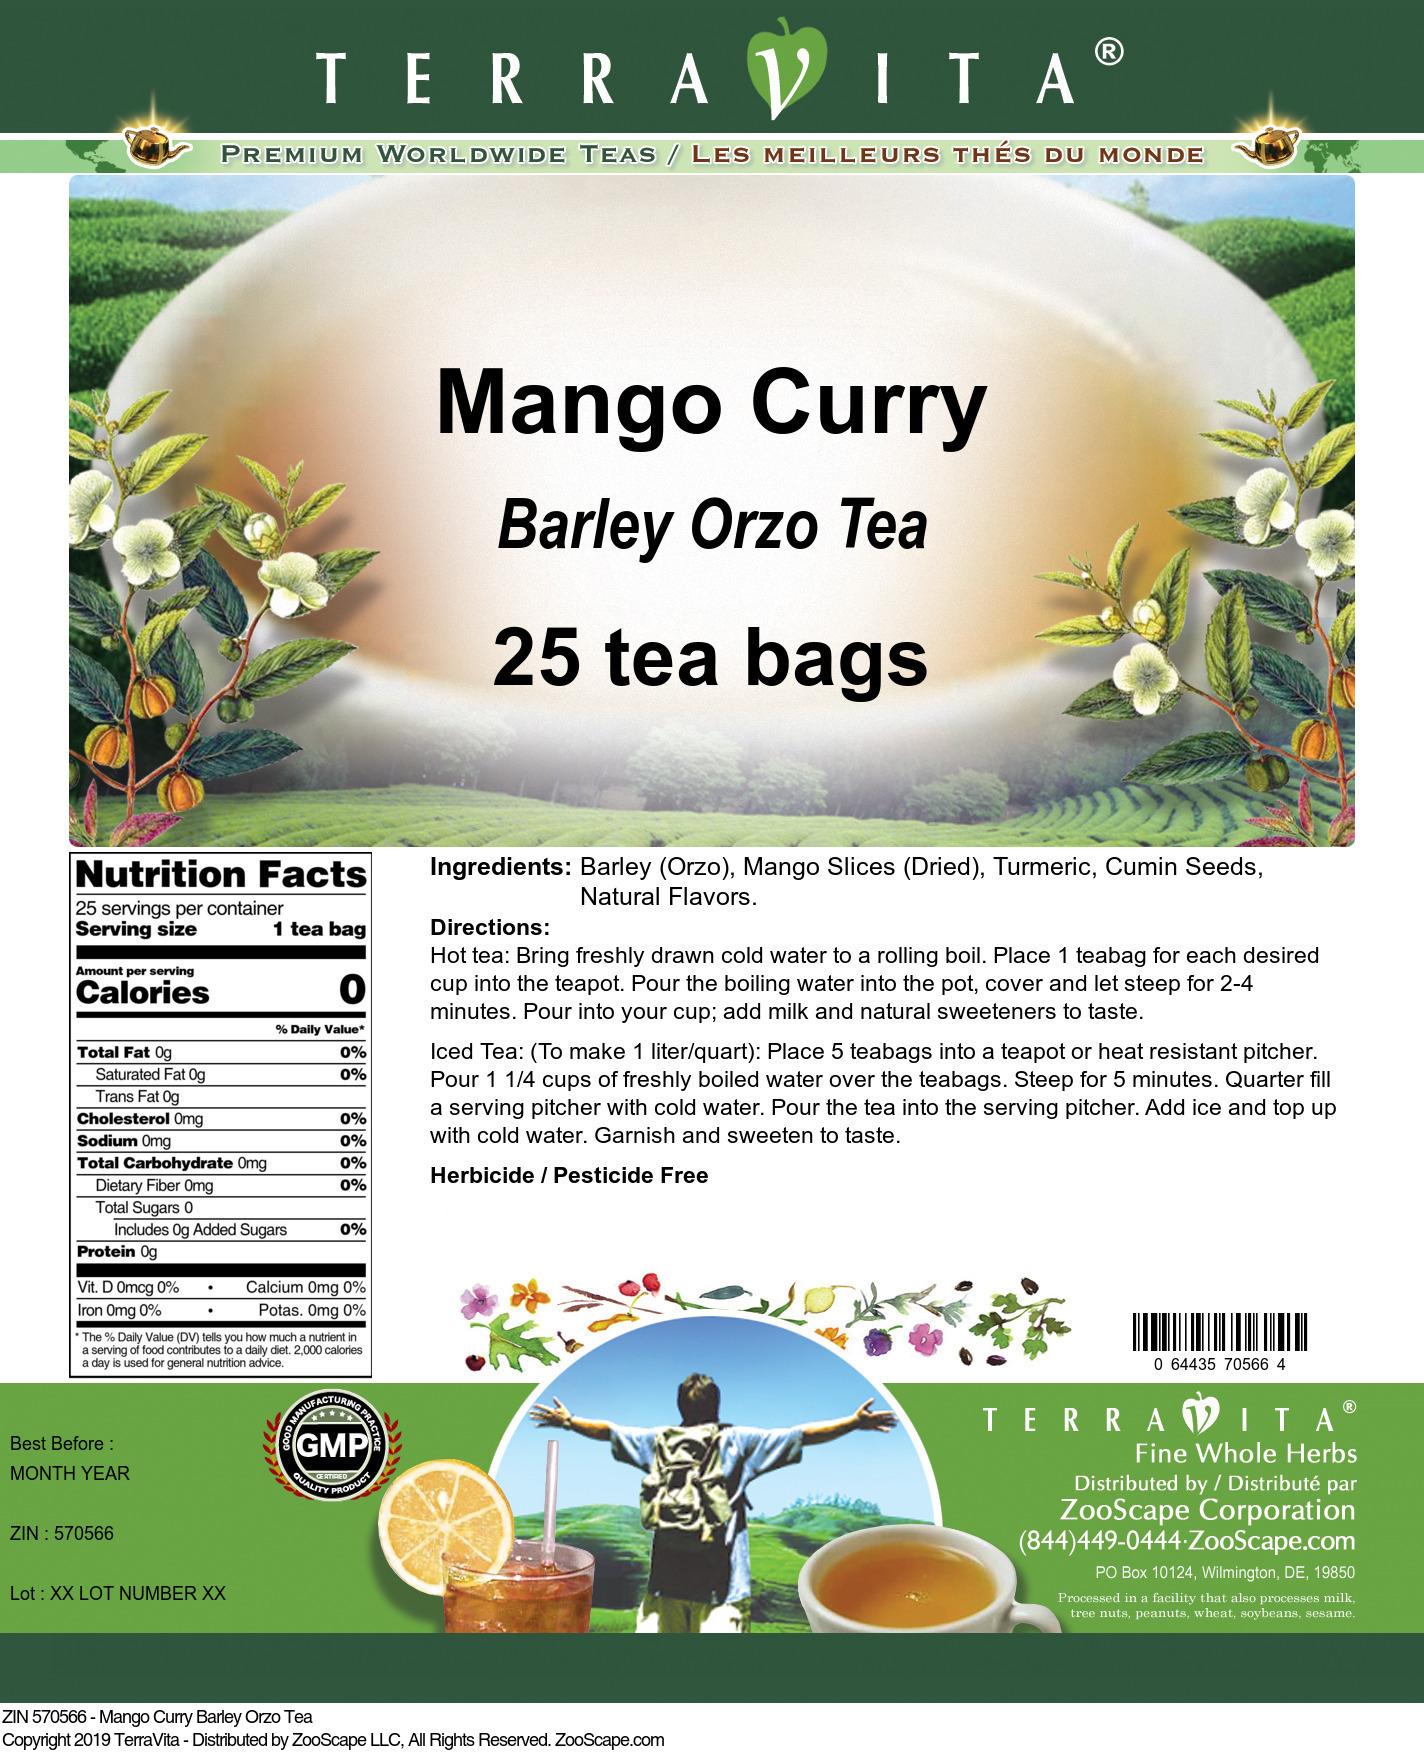 Mango Curry Barley Orzo Tea